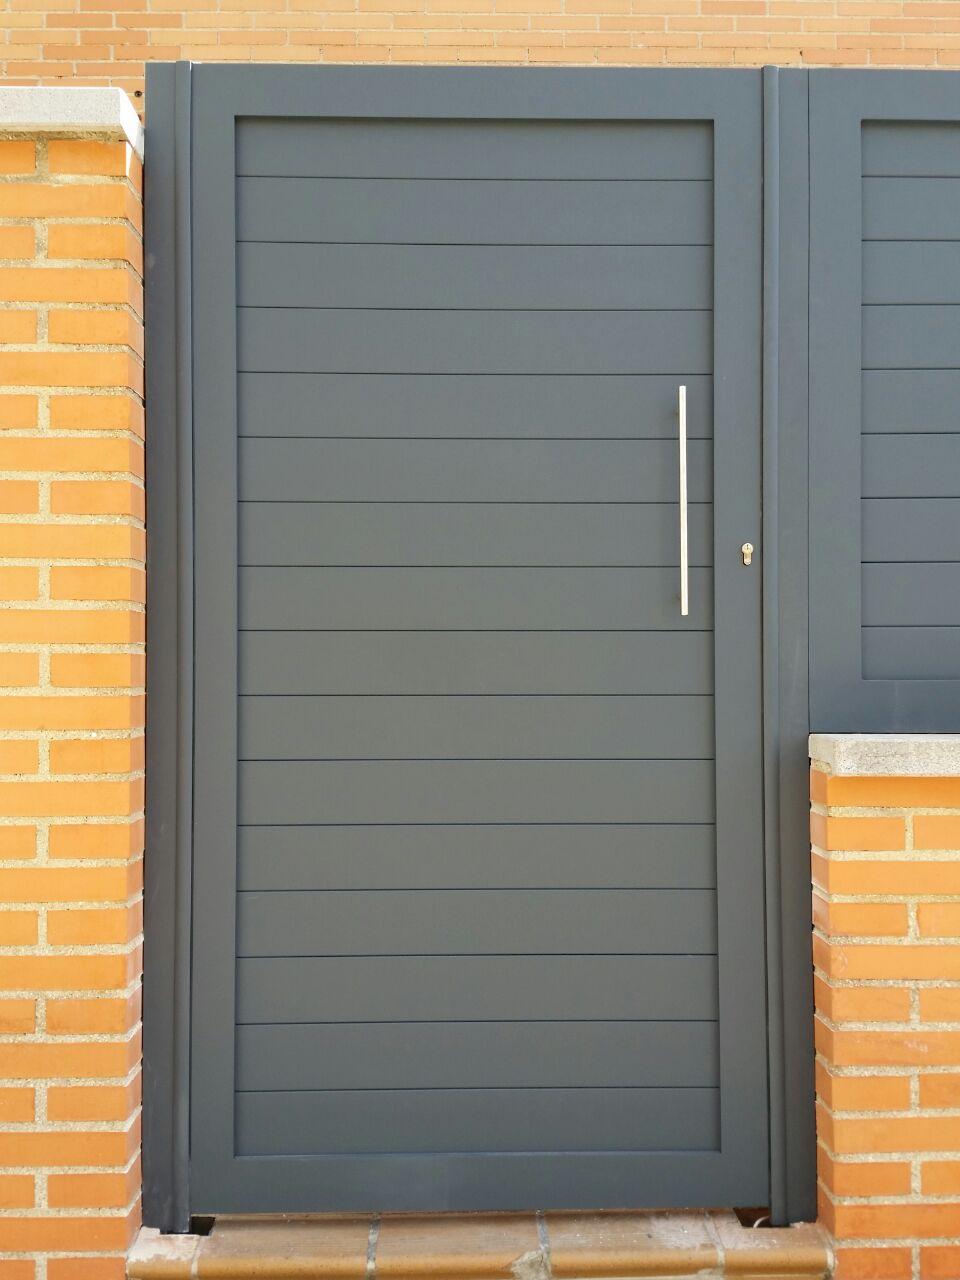 Puertas de aluminio exteriores free puertas corredizas for Puerta corrediza de aluminio